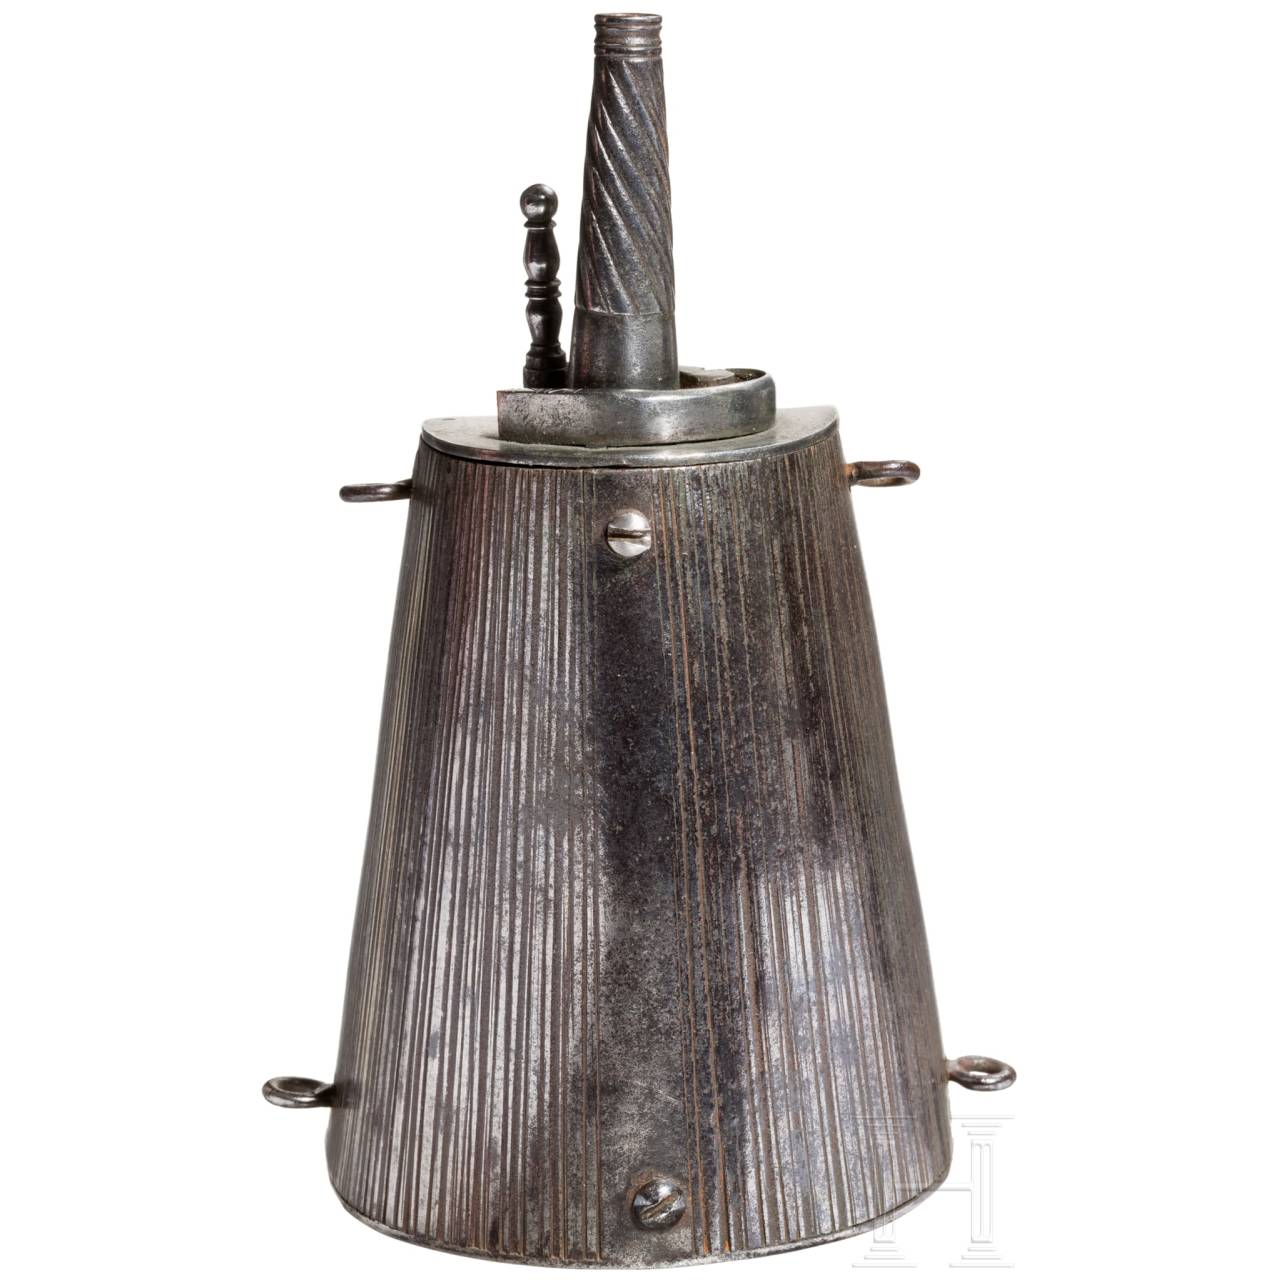 A Brescian iron powder-flask, early 17th century